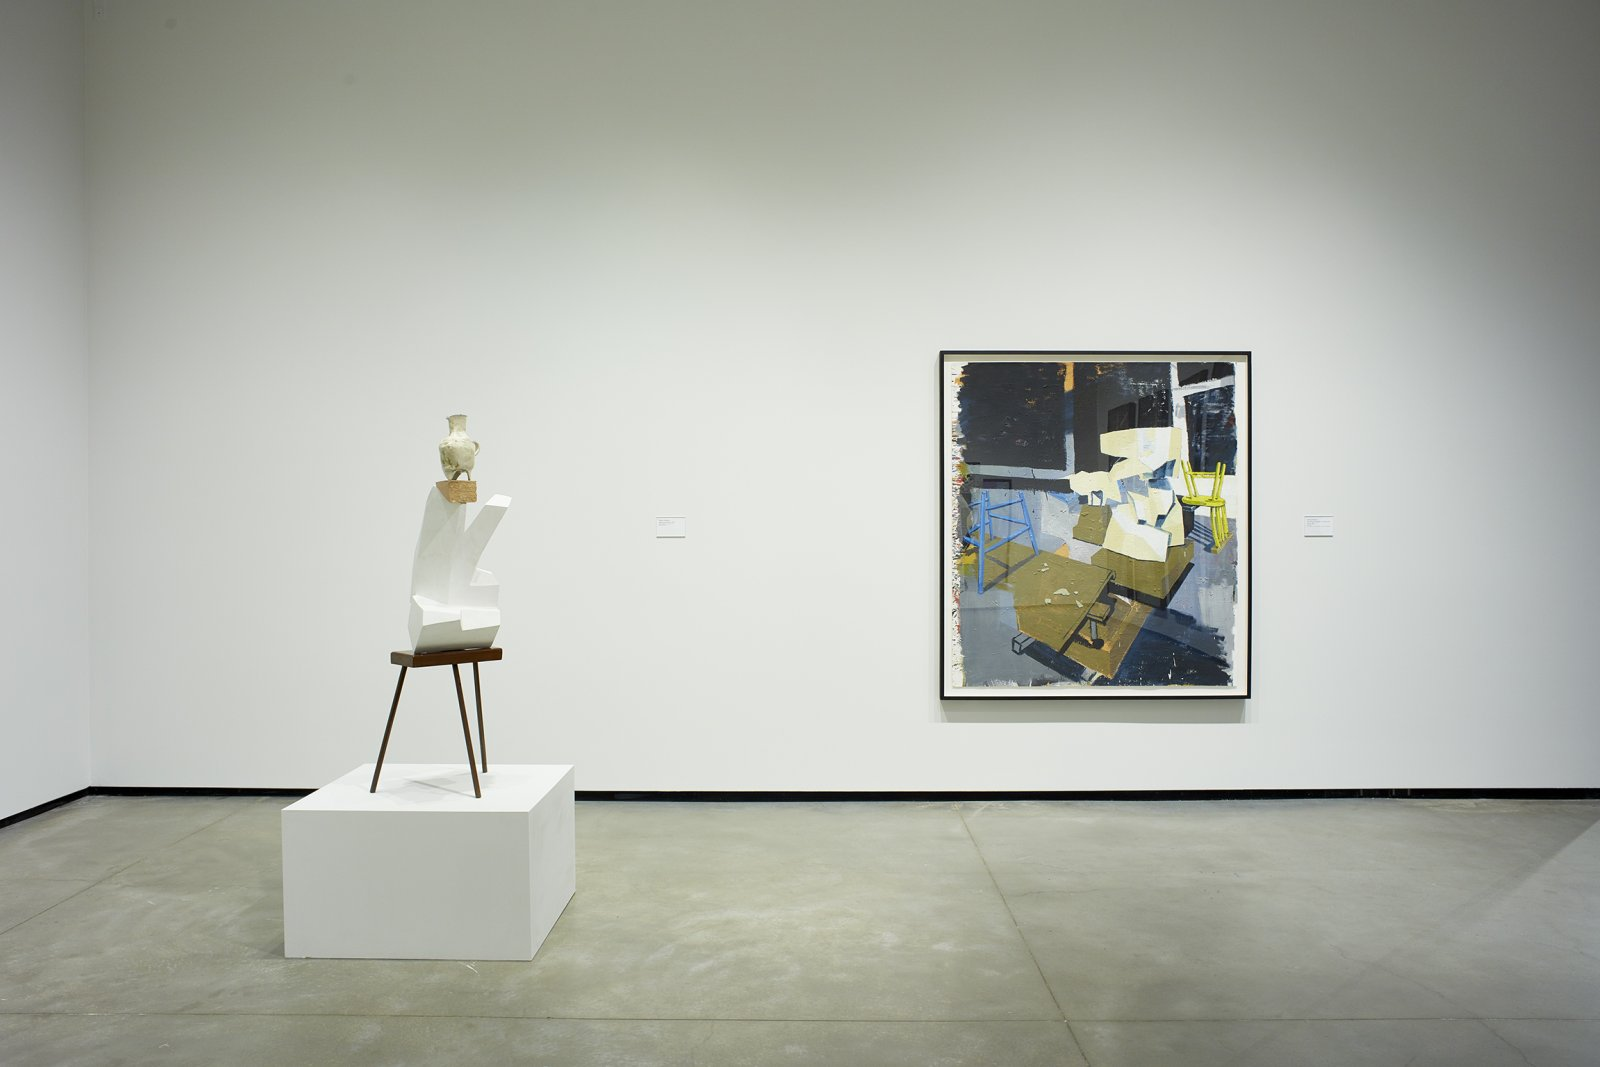 Ron Moppett, Damian Moppett, installation view, Every Story Has Two Sides, Art Gallery of Alberta, Edmonton, 2016 by Damian Moppett